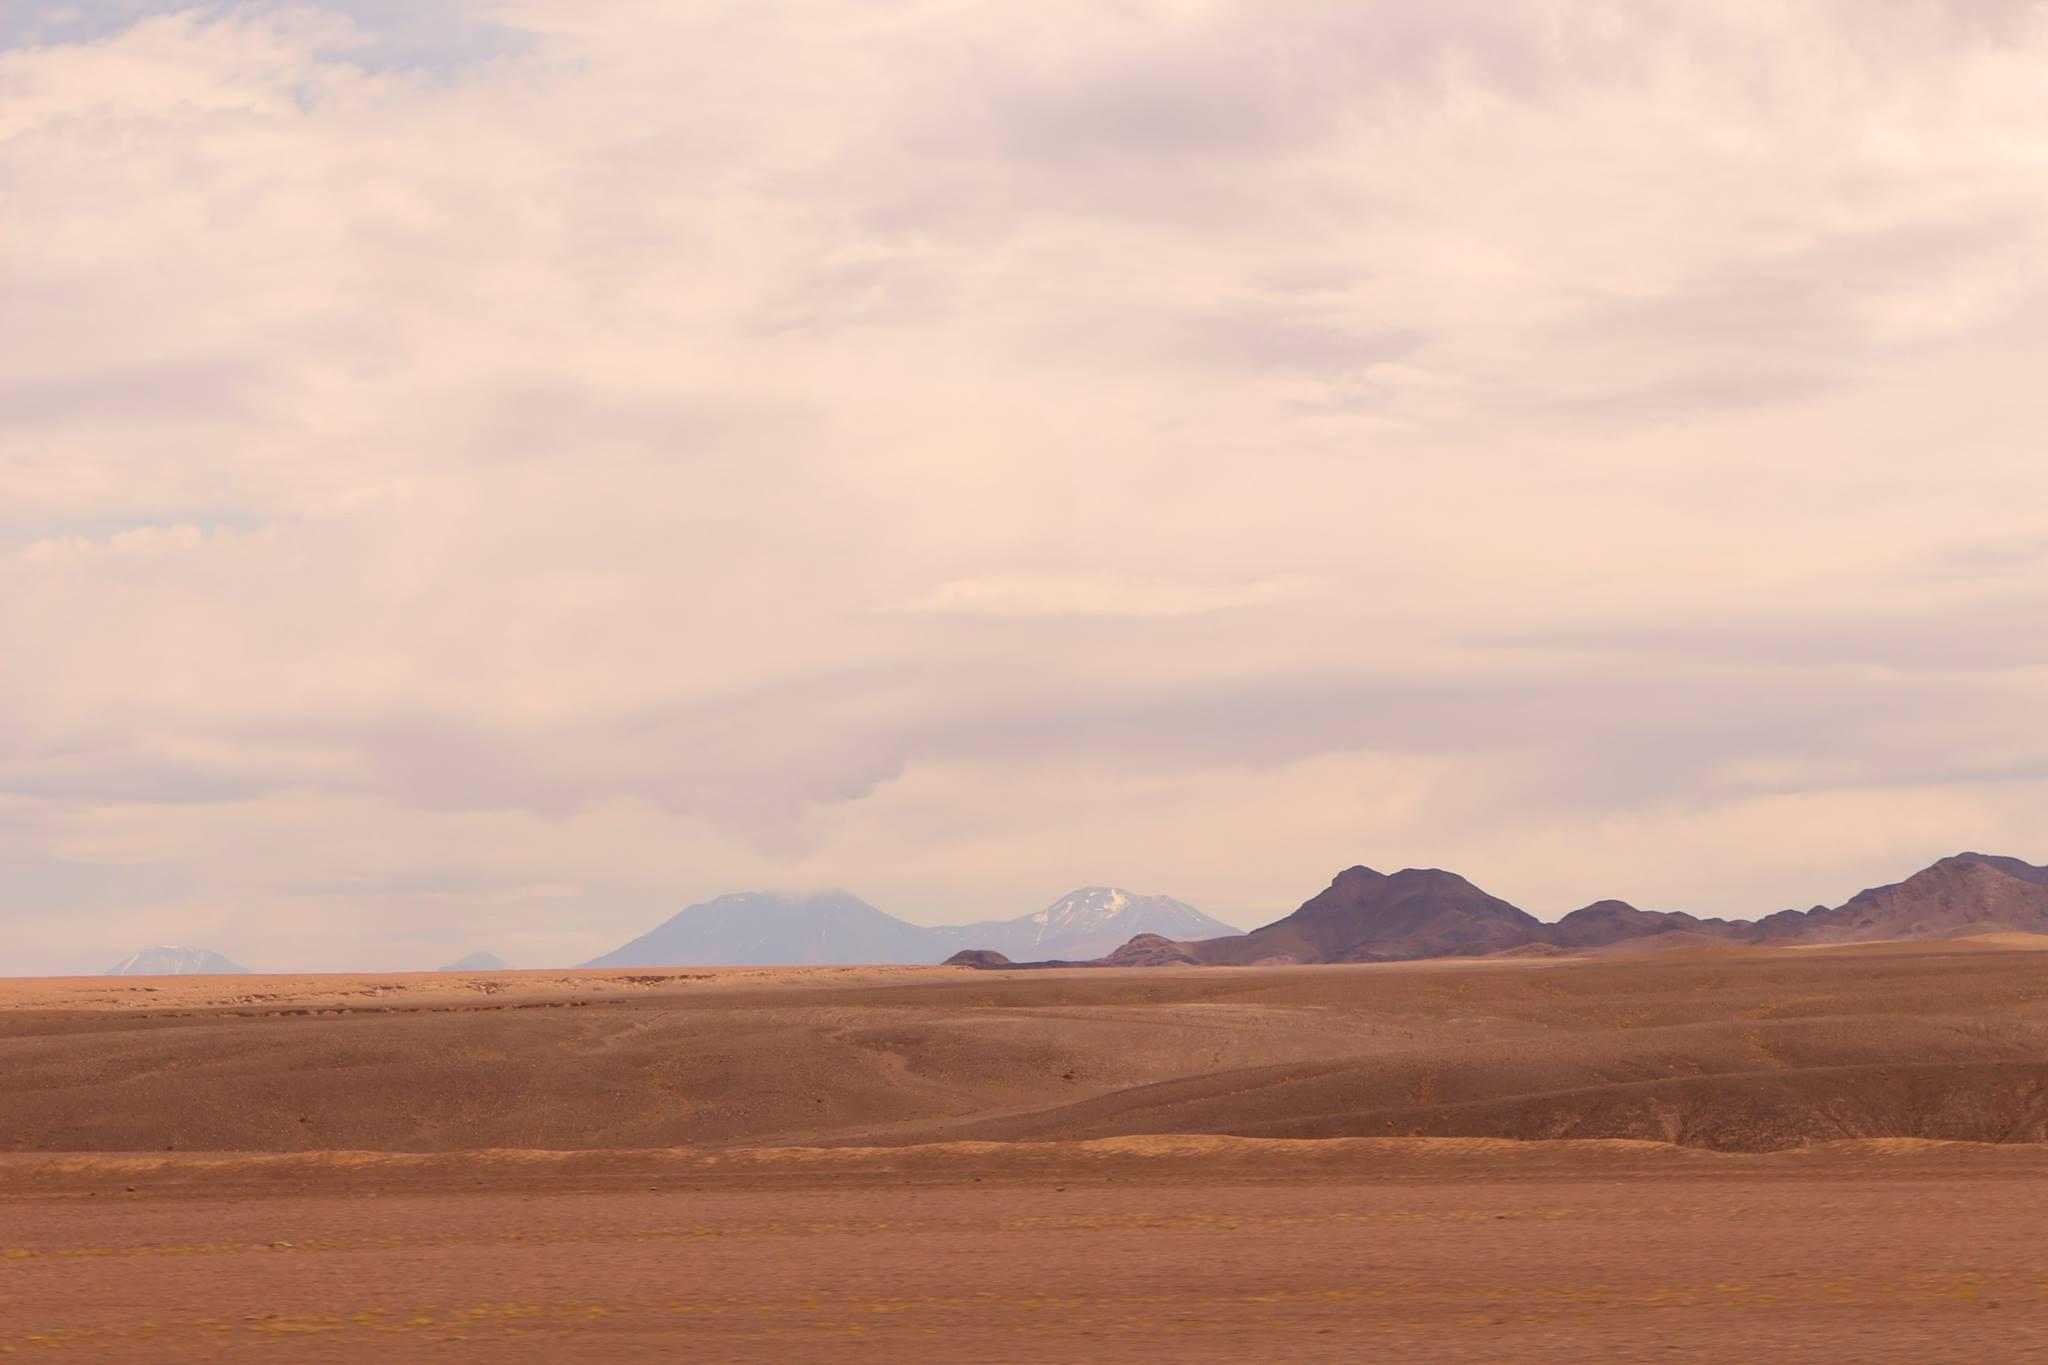 Estrada San Pedro de Atacama